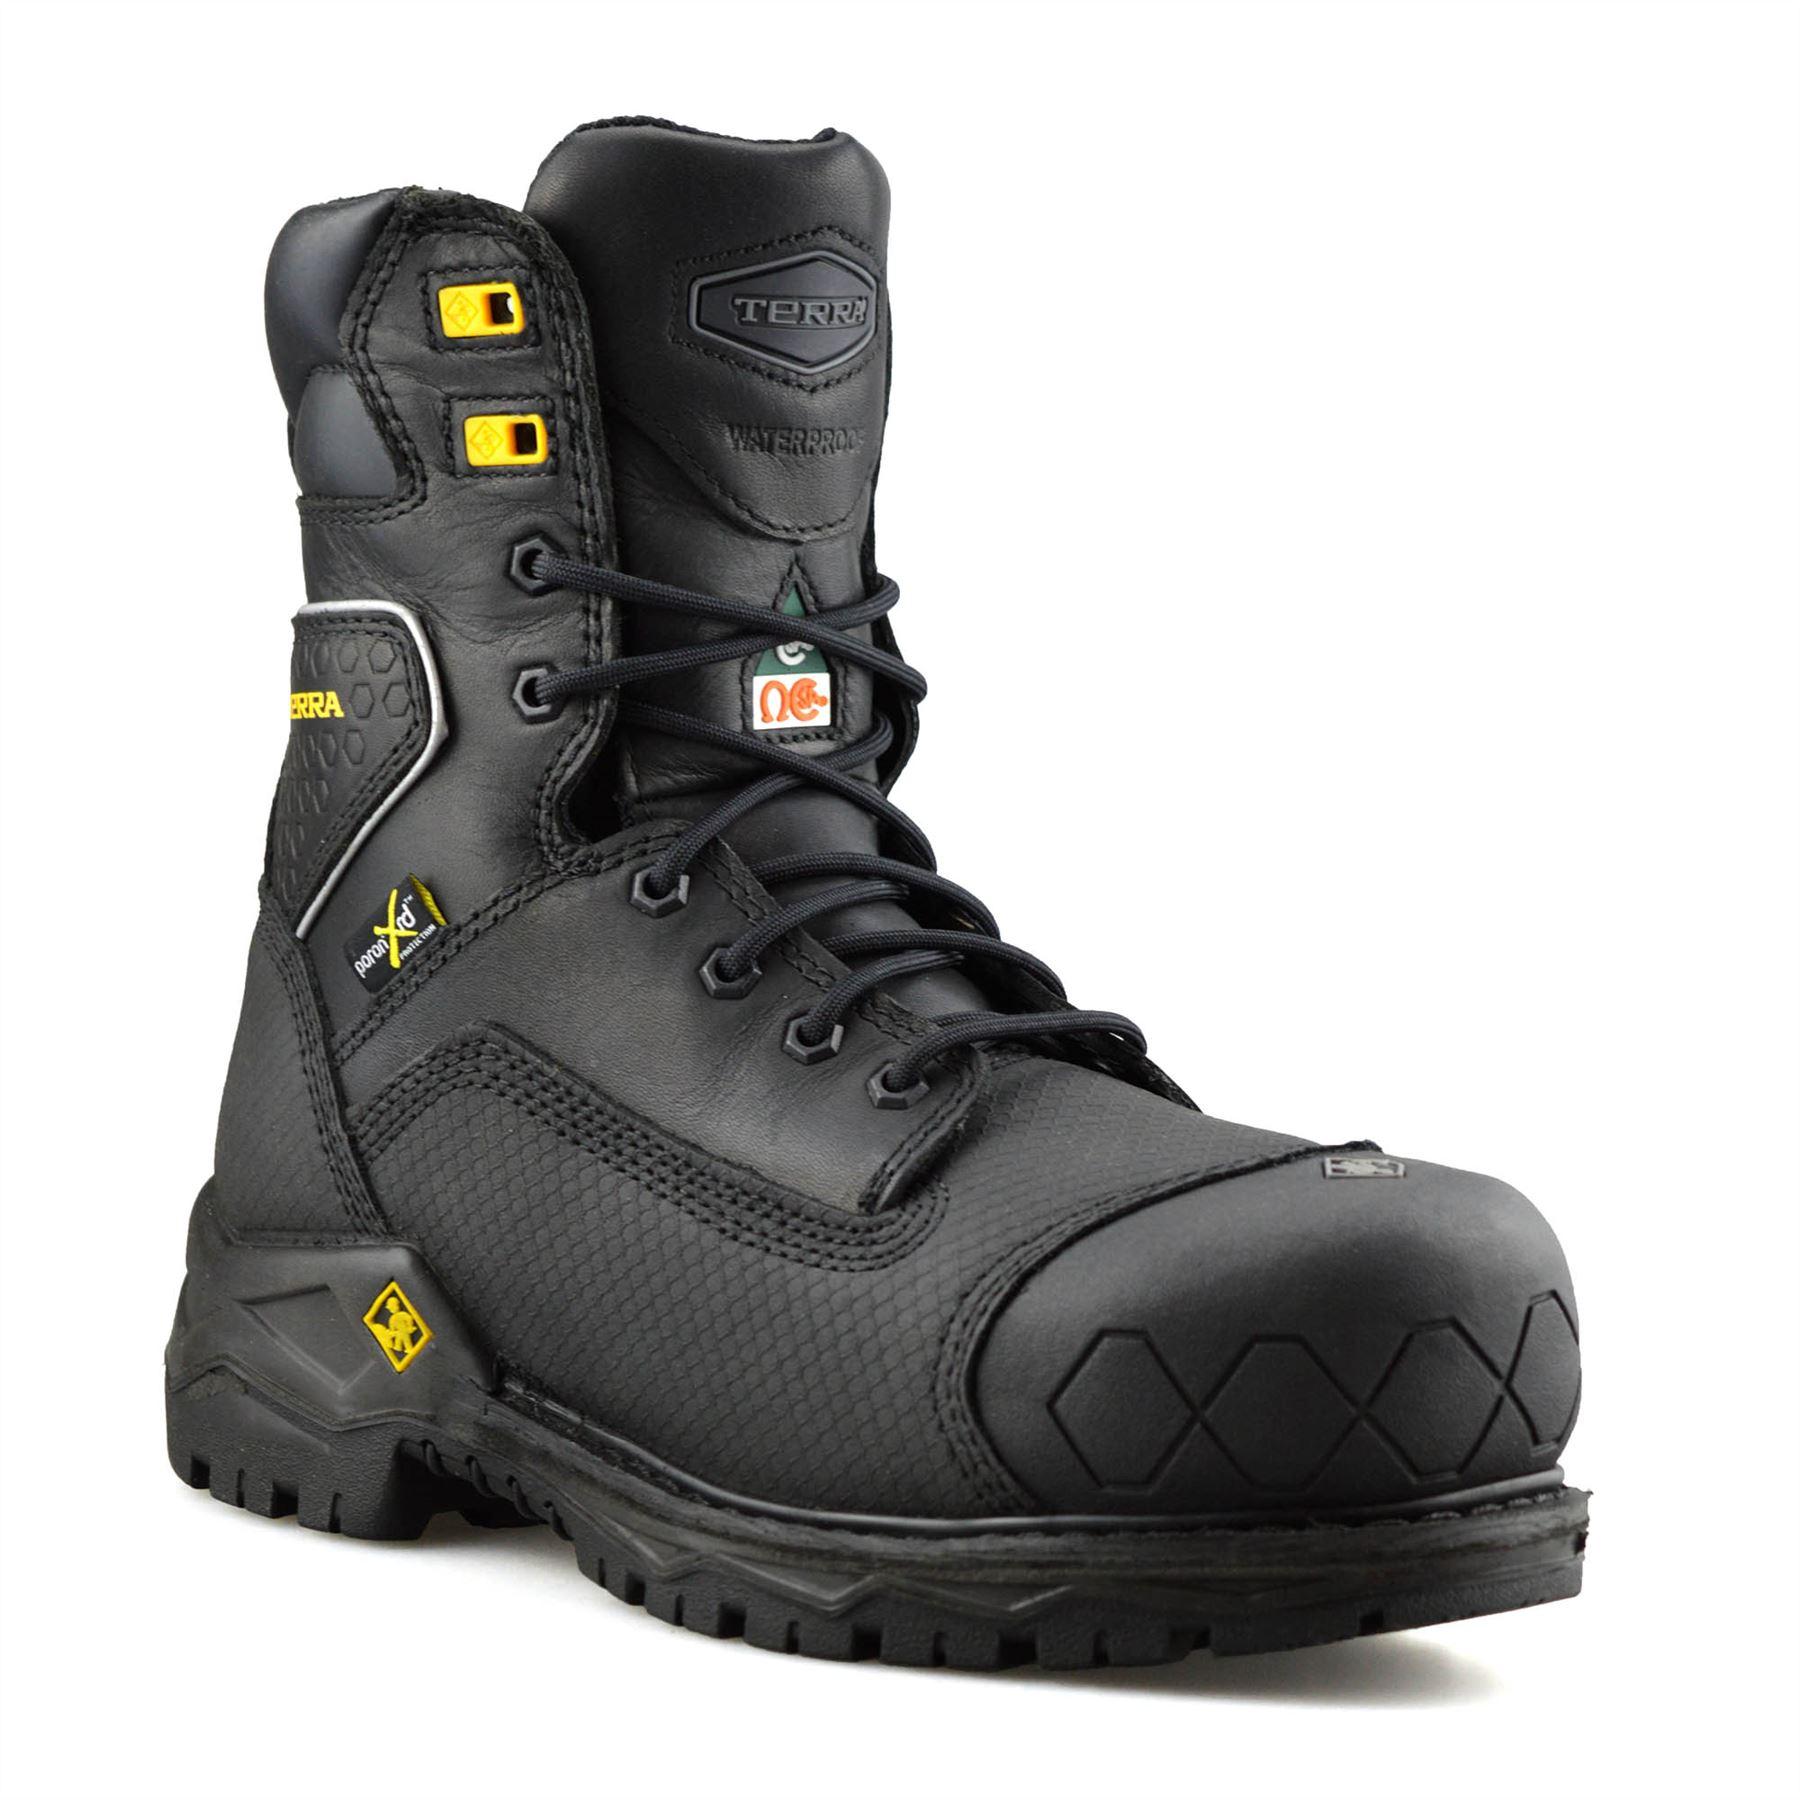 Mens Terra Sawtooth Leather Waterproof